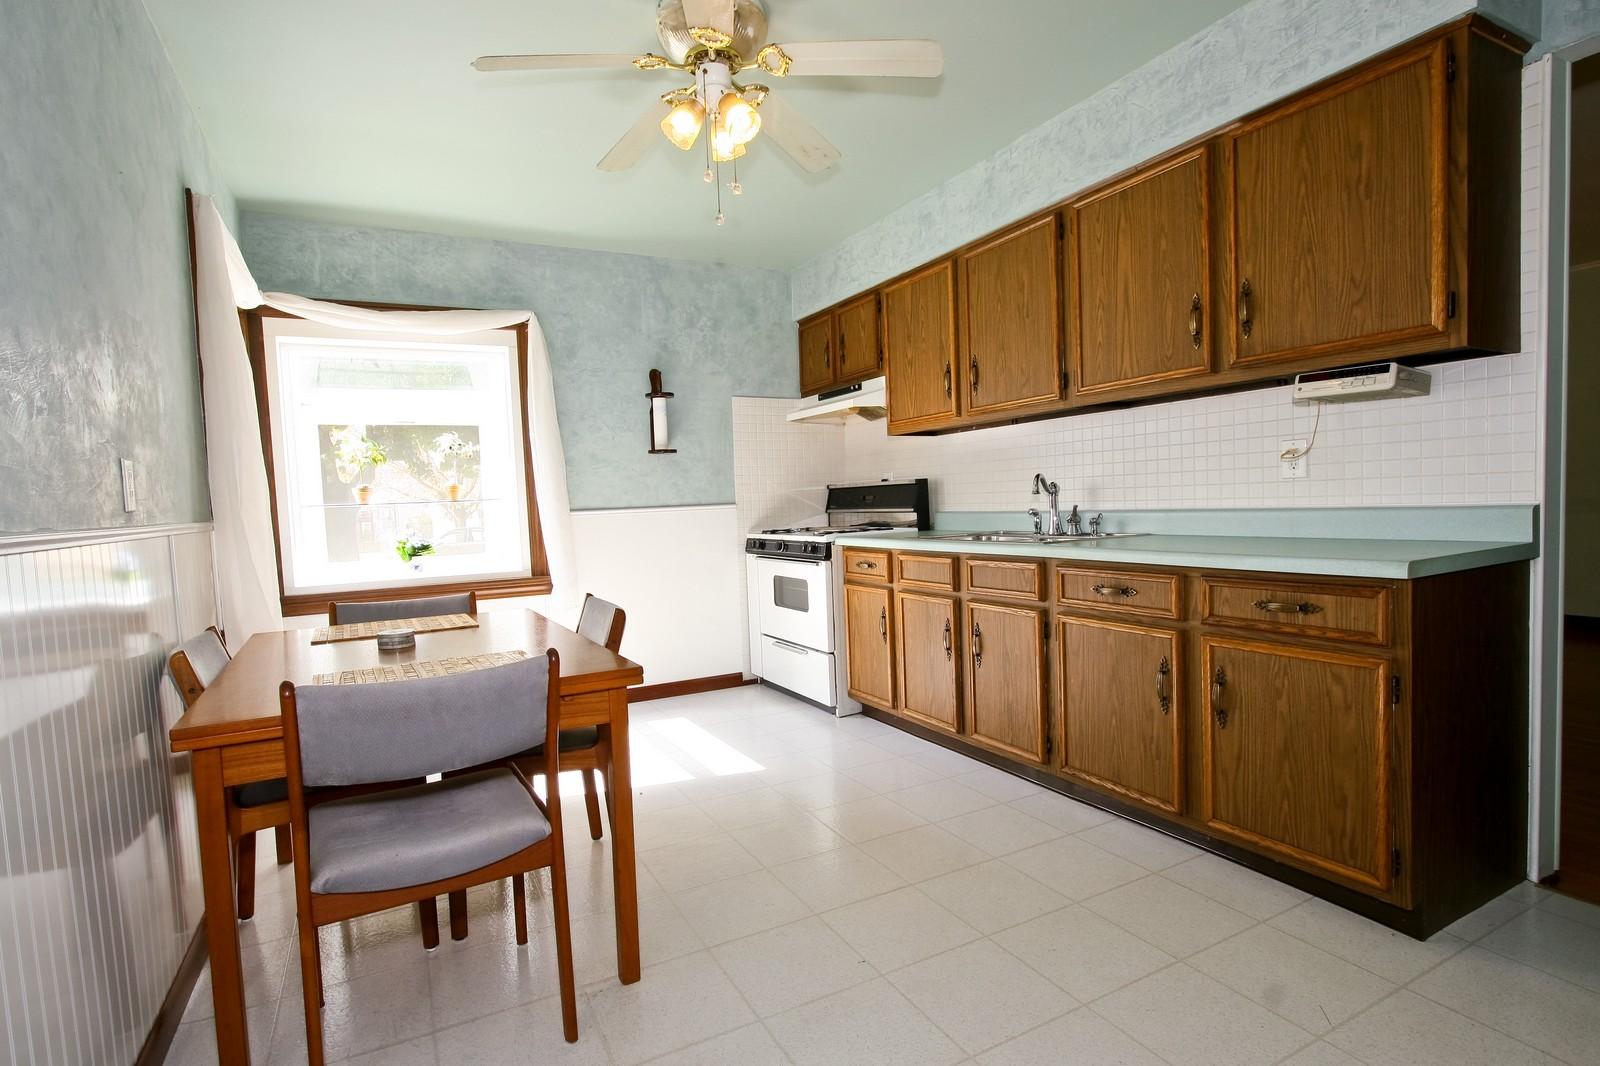 Real Estate Photography - 5813 S Natoma, Chicago, IL, 60638 - Kitchen